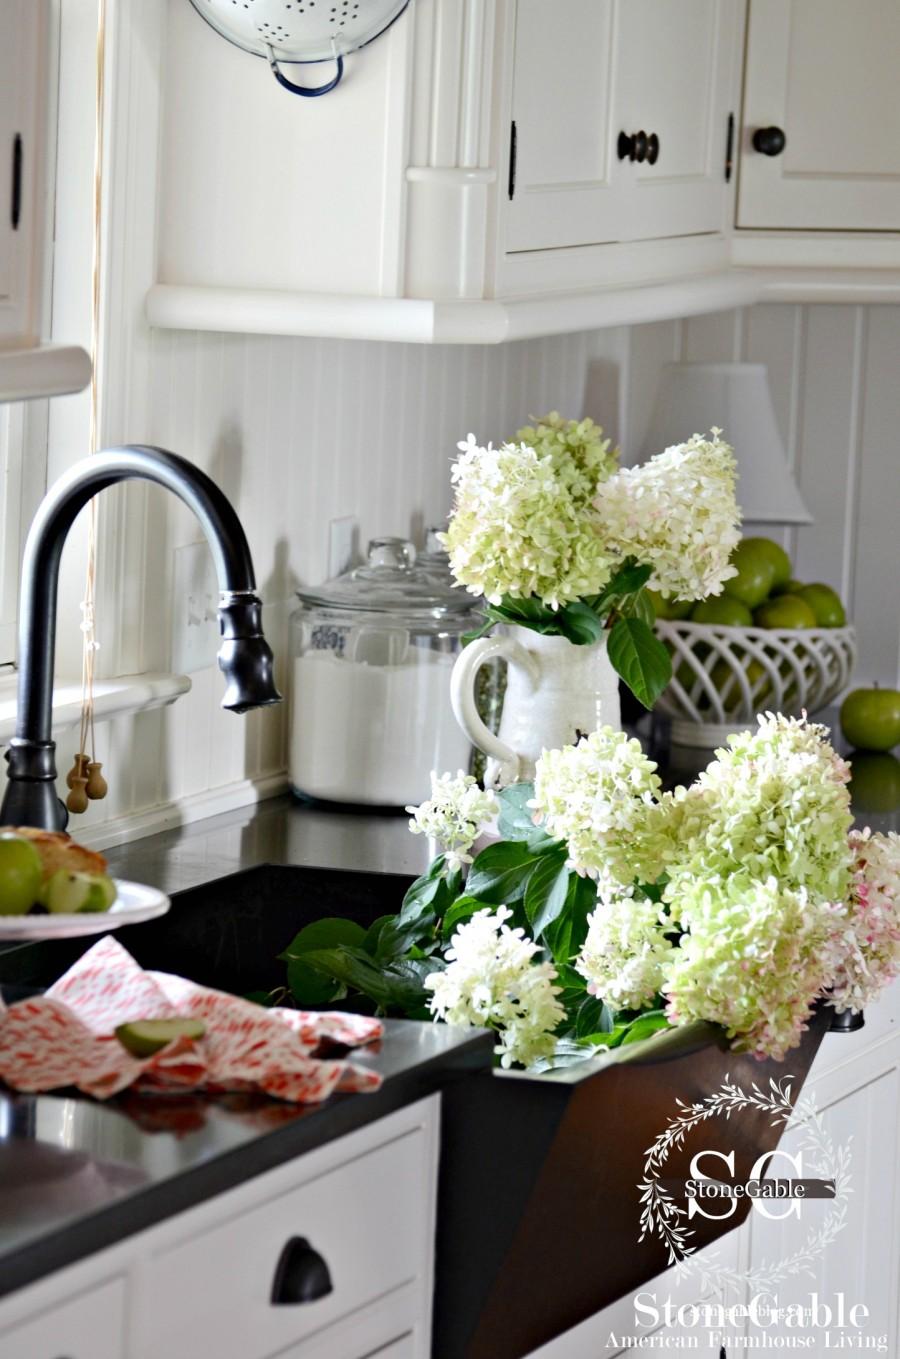 farmhouse style-sink-stonegableblog.com